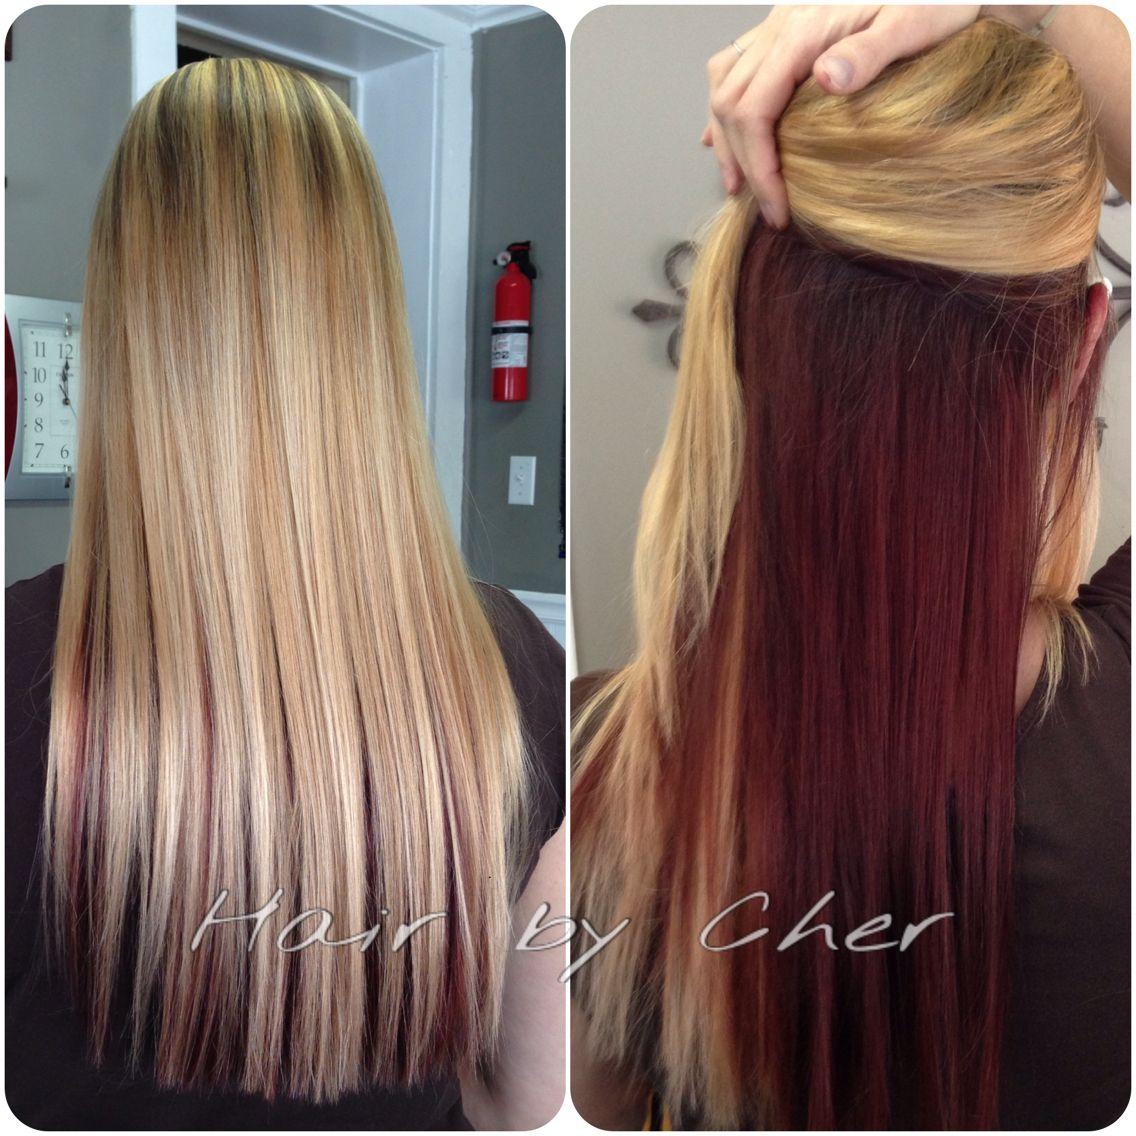 Blonde highlights ideas pinterest - Blonde And Red Hair Blonde Highlights And Red Hidden Underneath